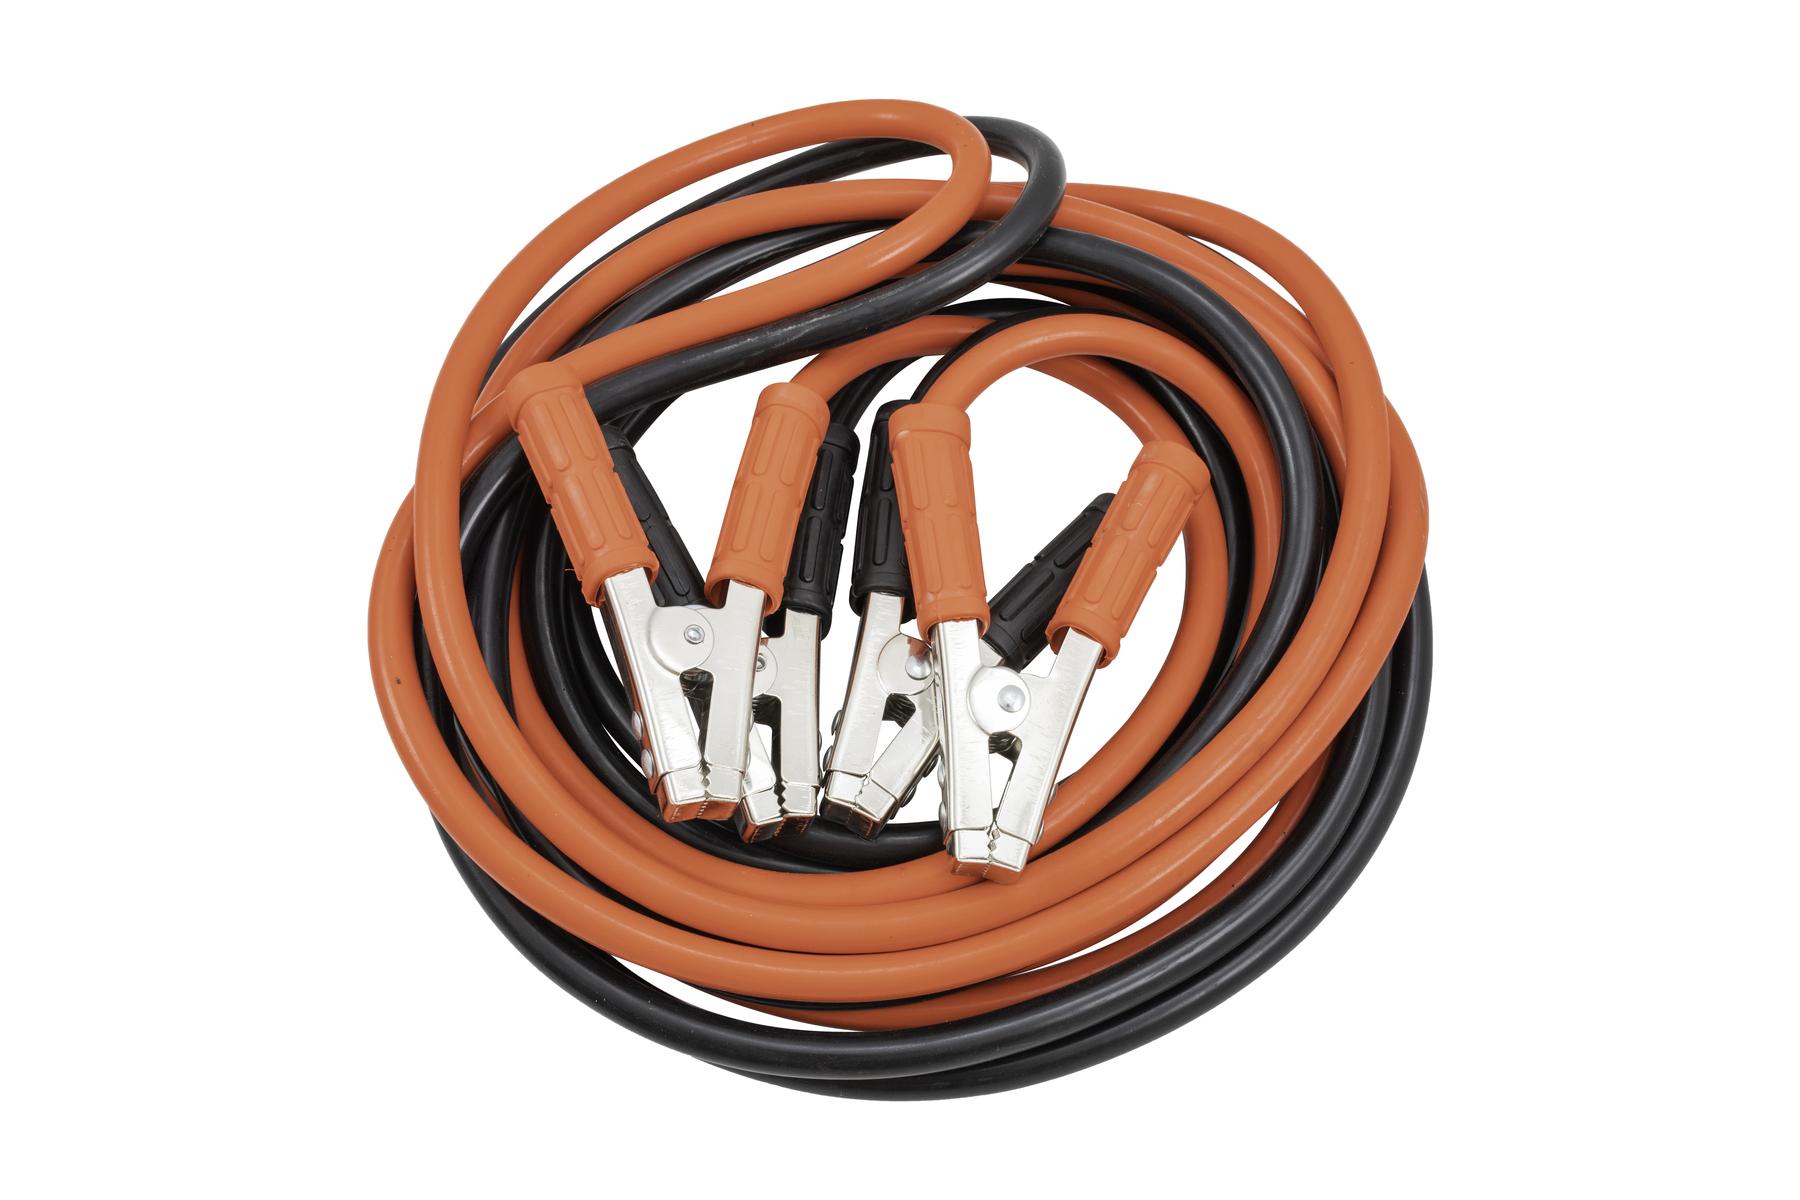 Startovací kabely 800A, délka 3 m - QUATROS QS14408